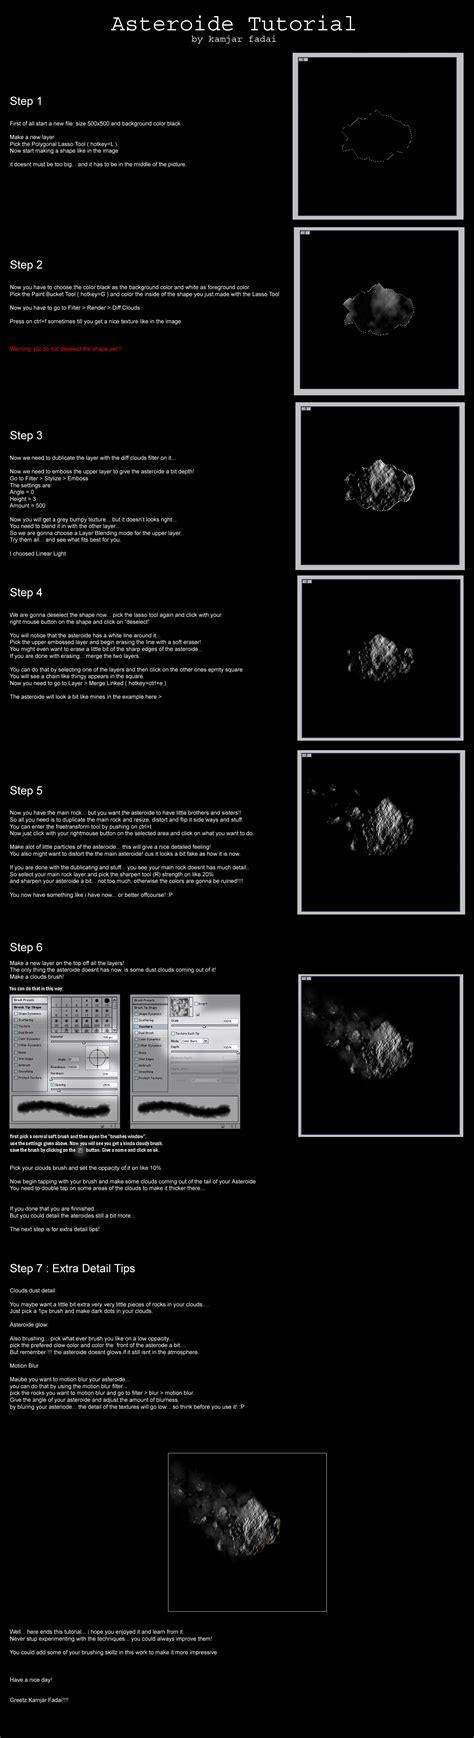 construct 2 asteroid tutorial photoshop打造美妙绝伦的宇宙星空图形 photoshop教程 网页教学网